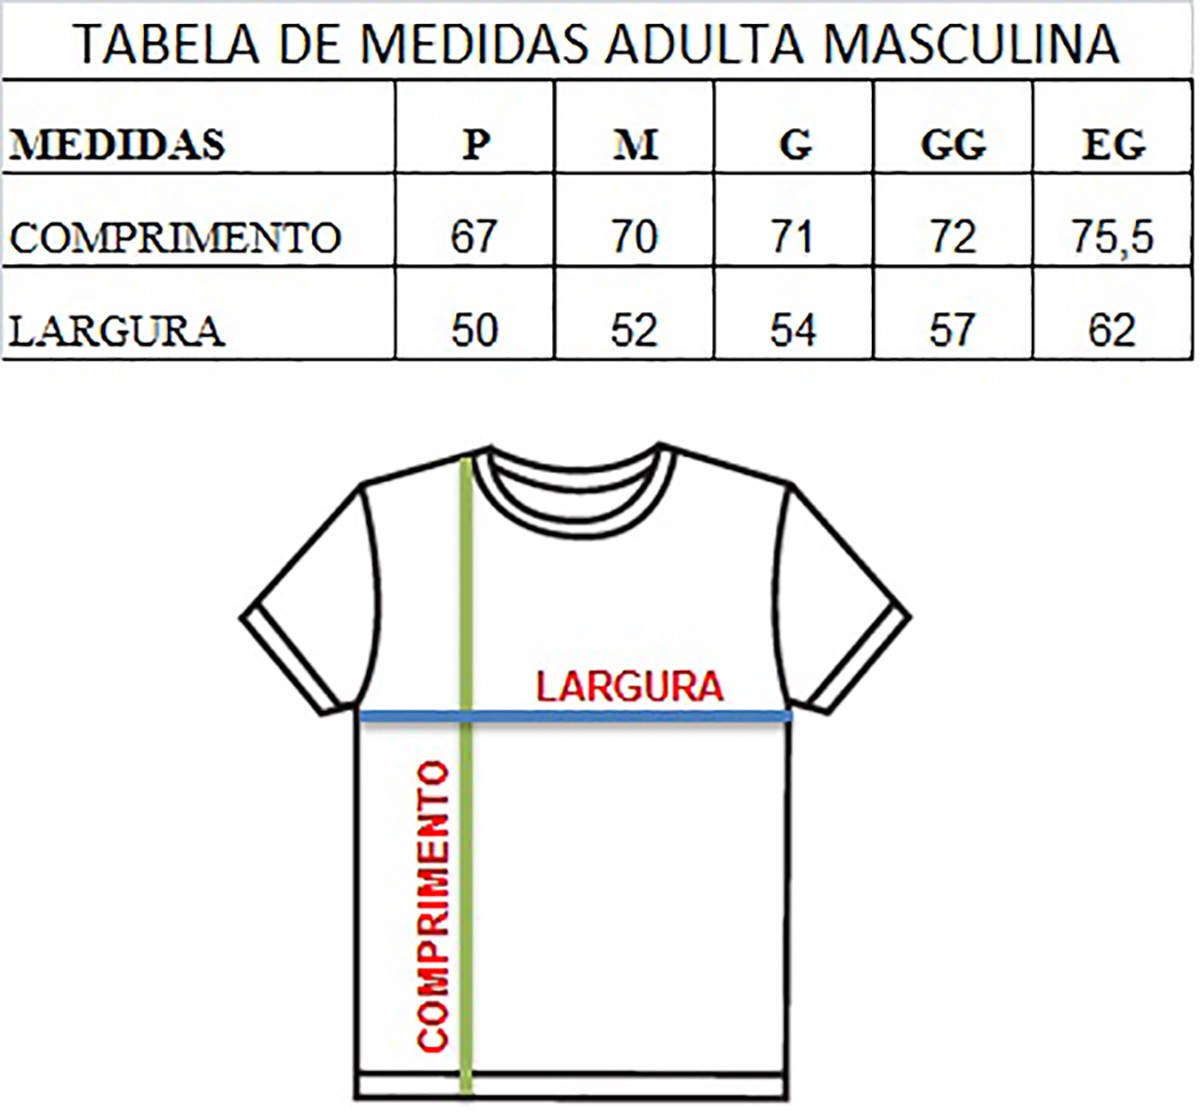 Camiseta t-shirt adulta masculina guitarras